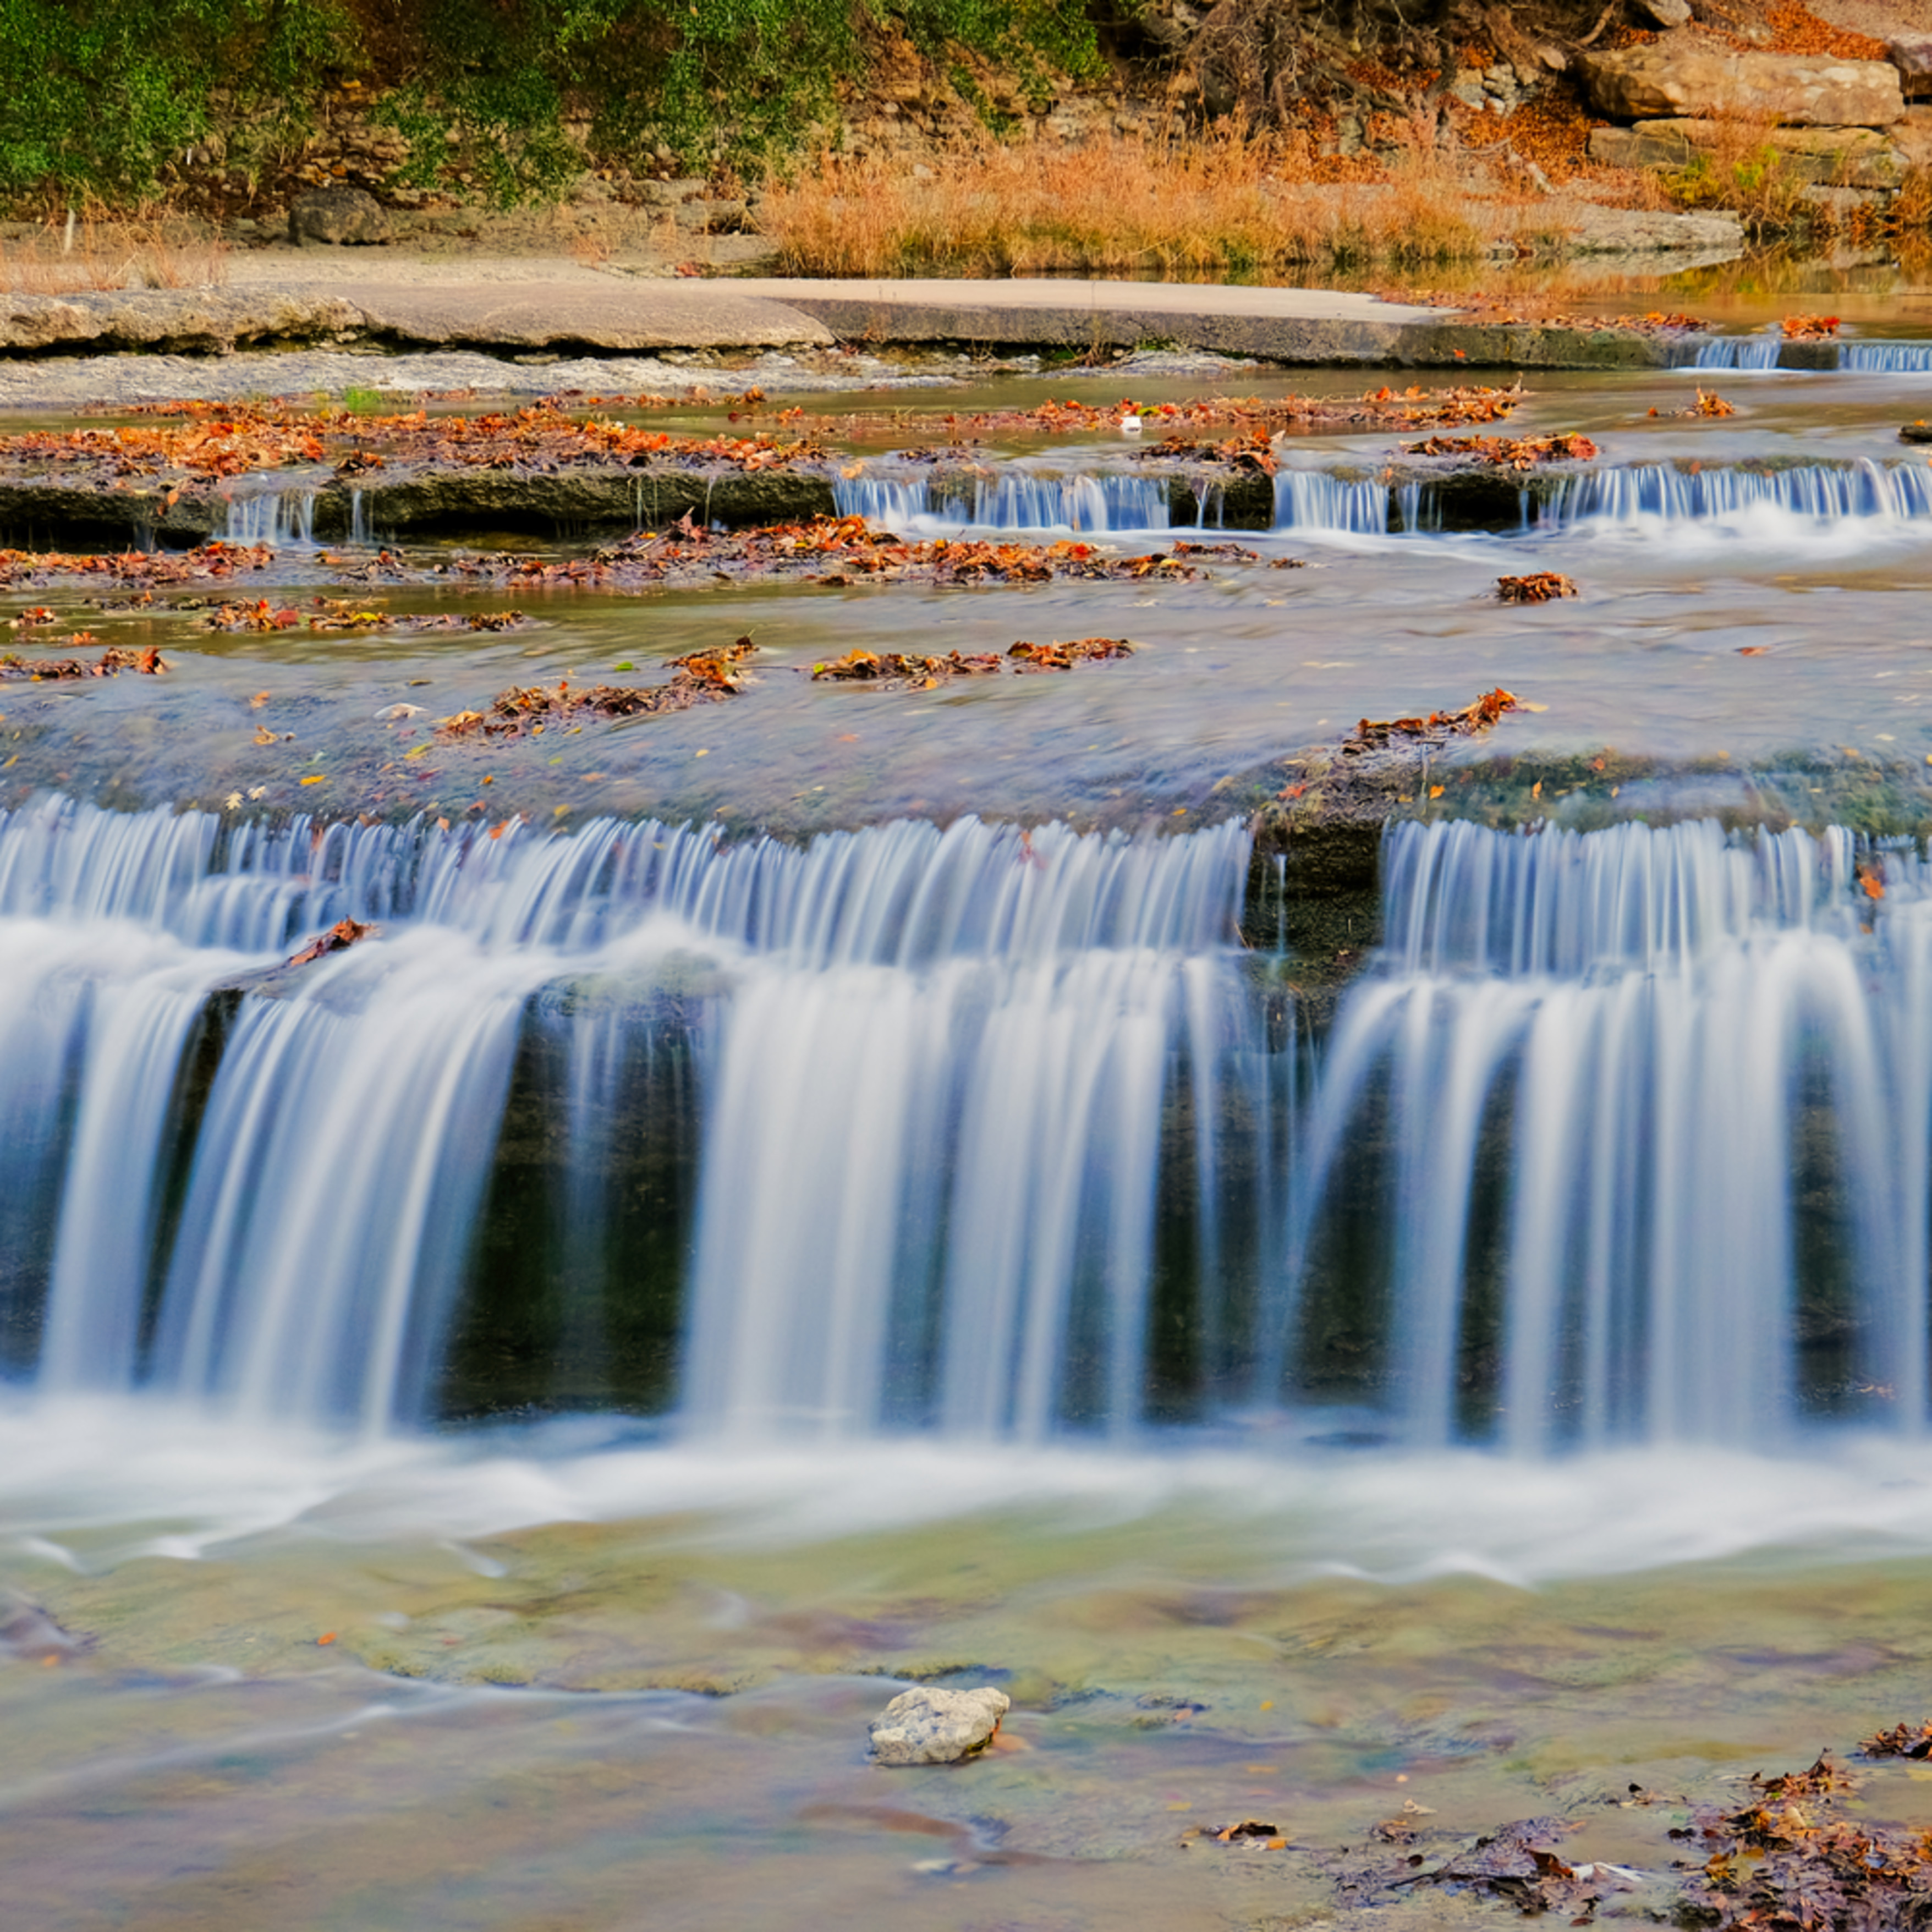 Waterfalls 18 iuyhmy